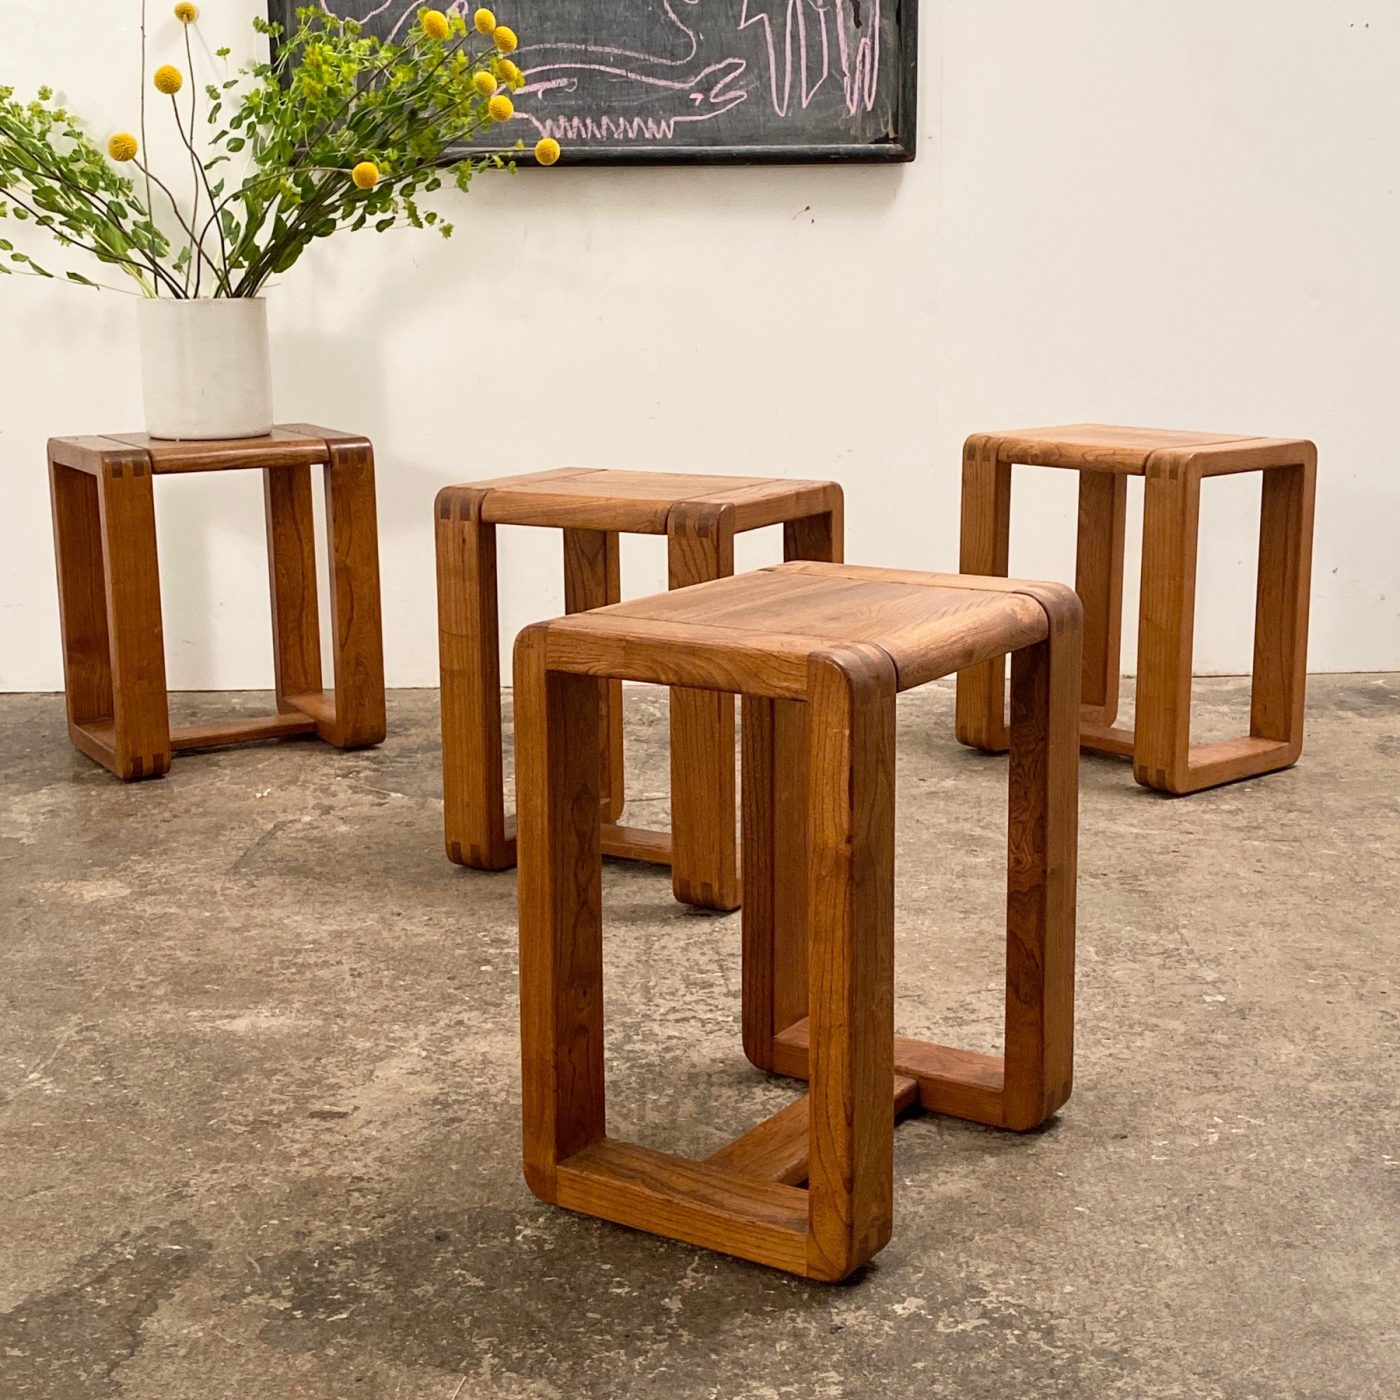 objet-vagabond-massive-stools0000